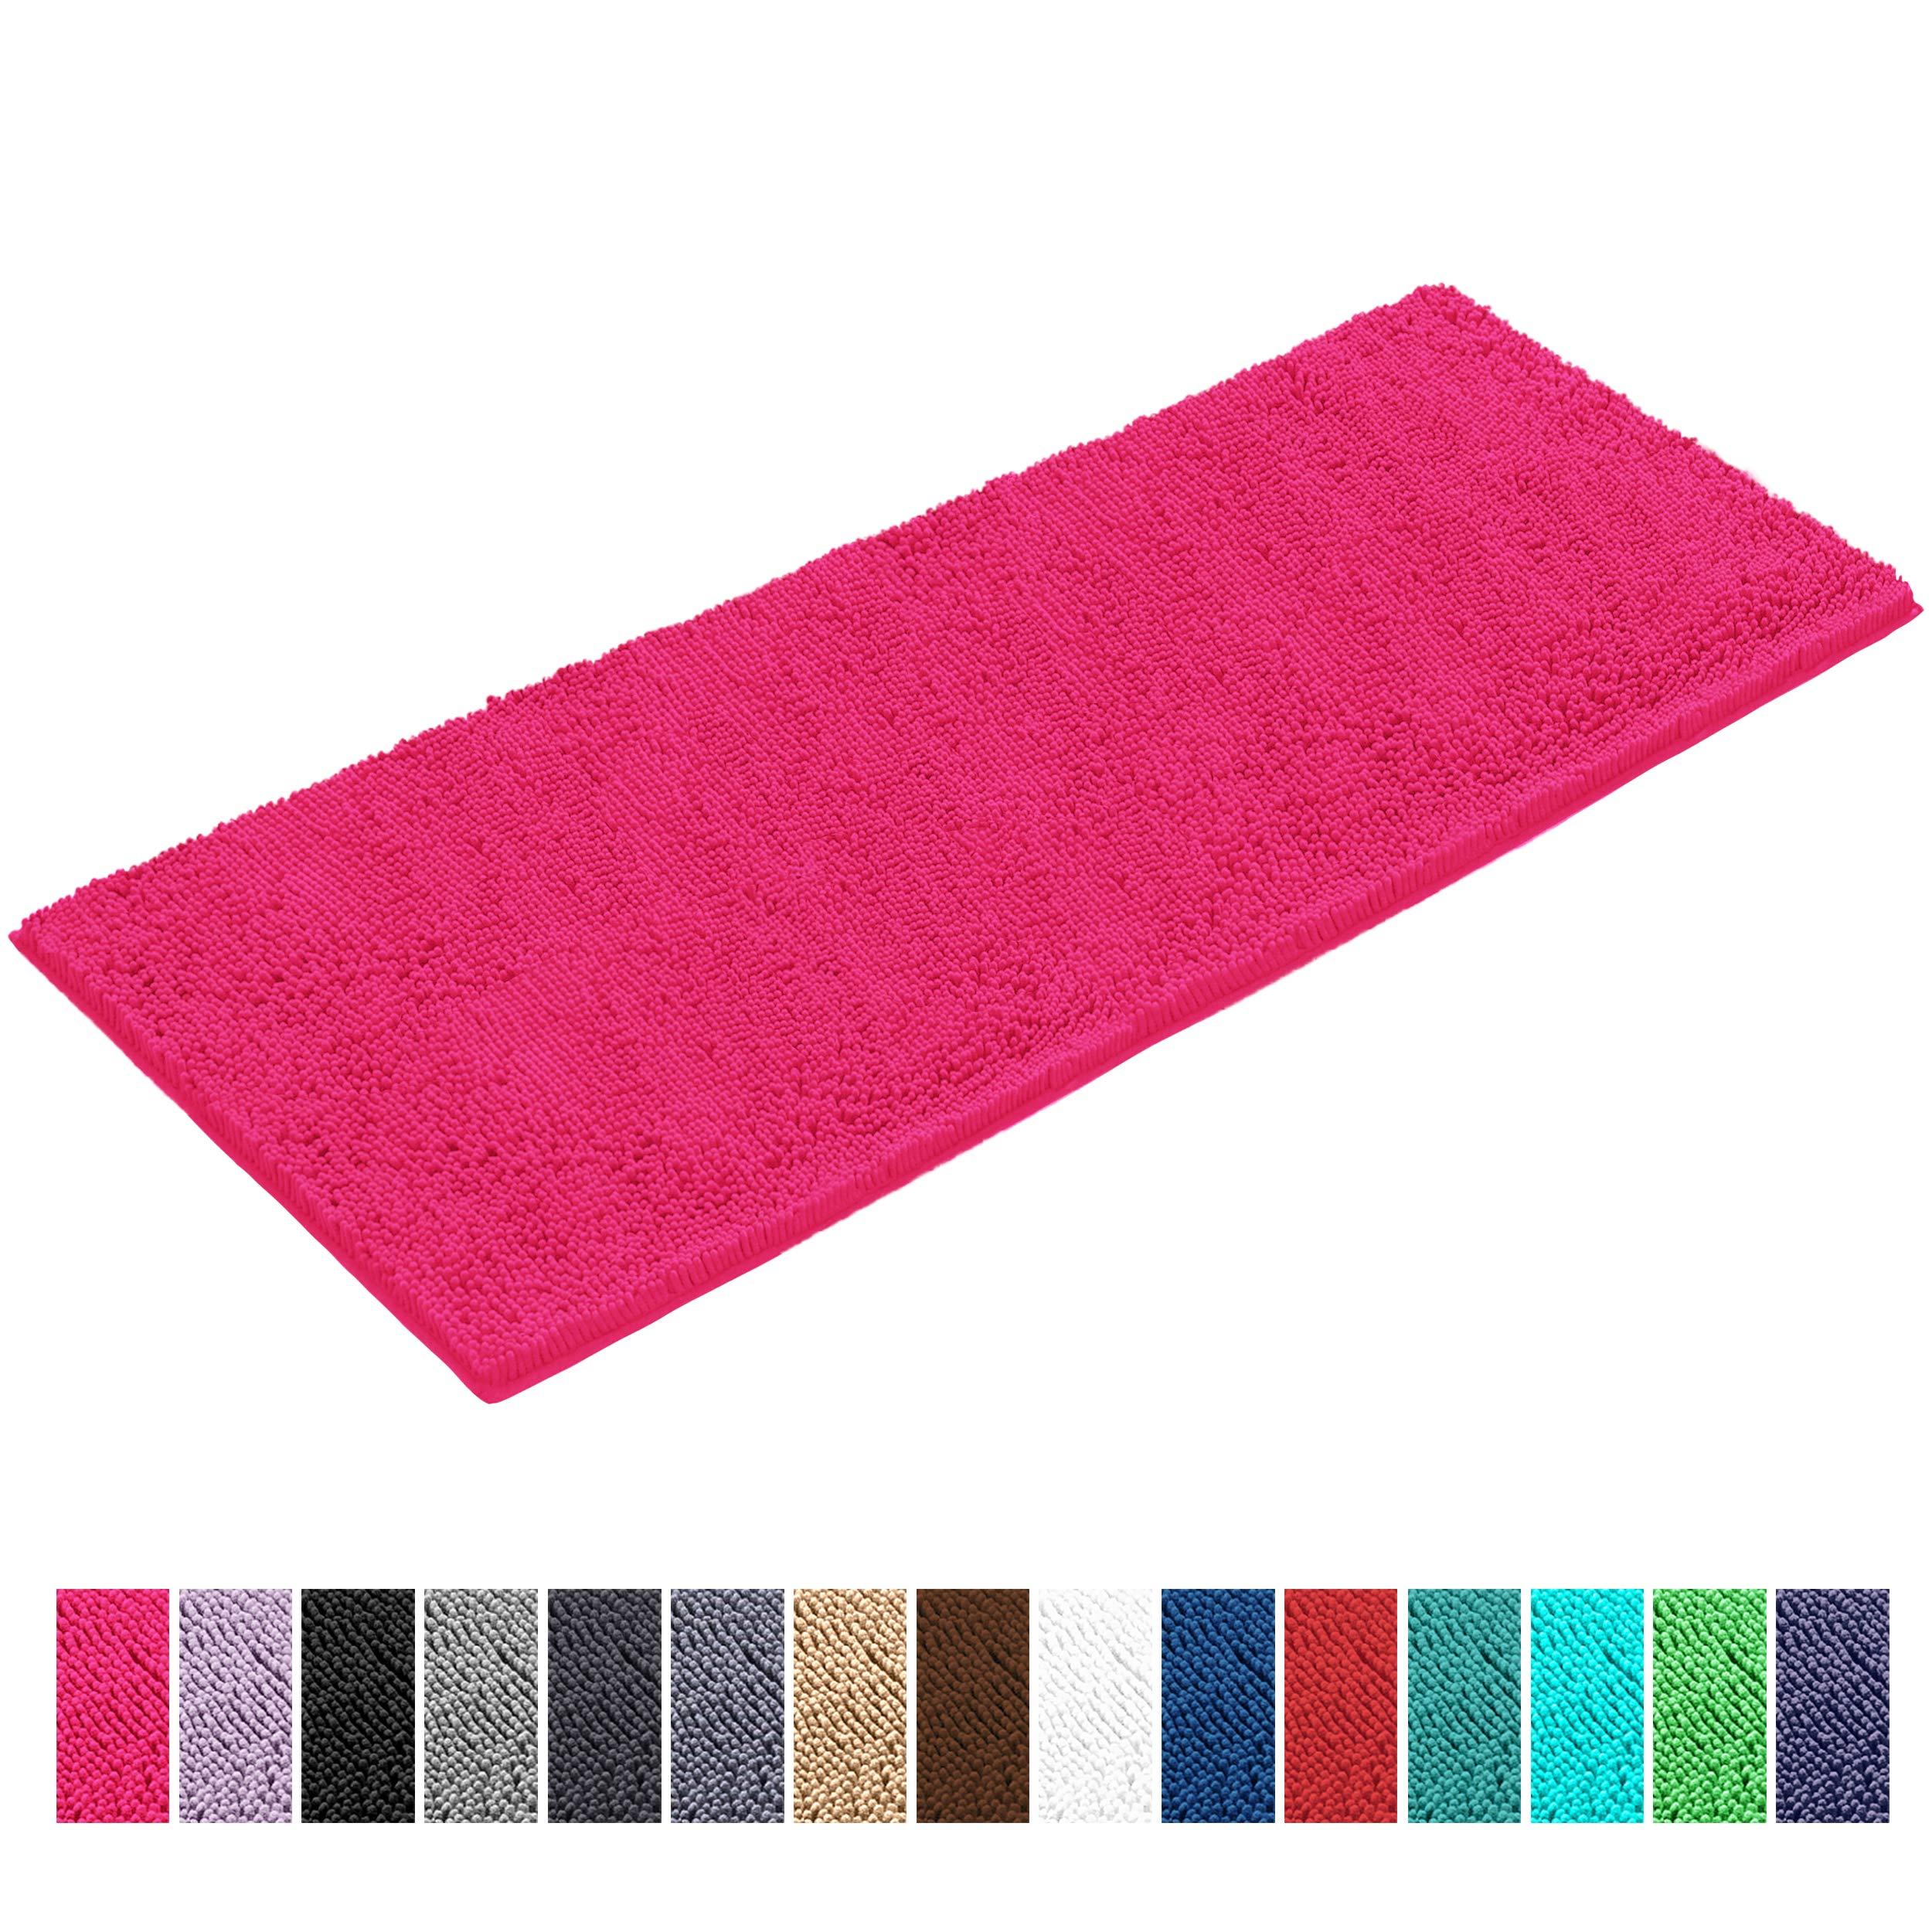 LuxUrux Bath Mat-Extra-Soft Plush Bath Shower Bathroom Rug,1'' Chenille Microfiber Material, Super Absorbent Shaggy Bath Rug. Machine Wash & Dry (27''x 47 inches, Hot Pink)